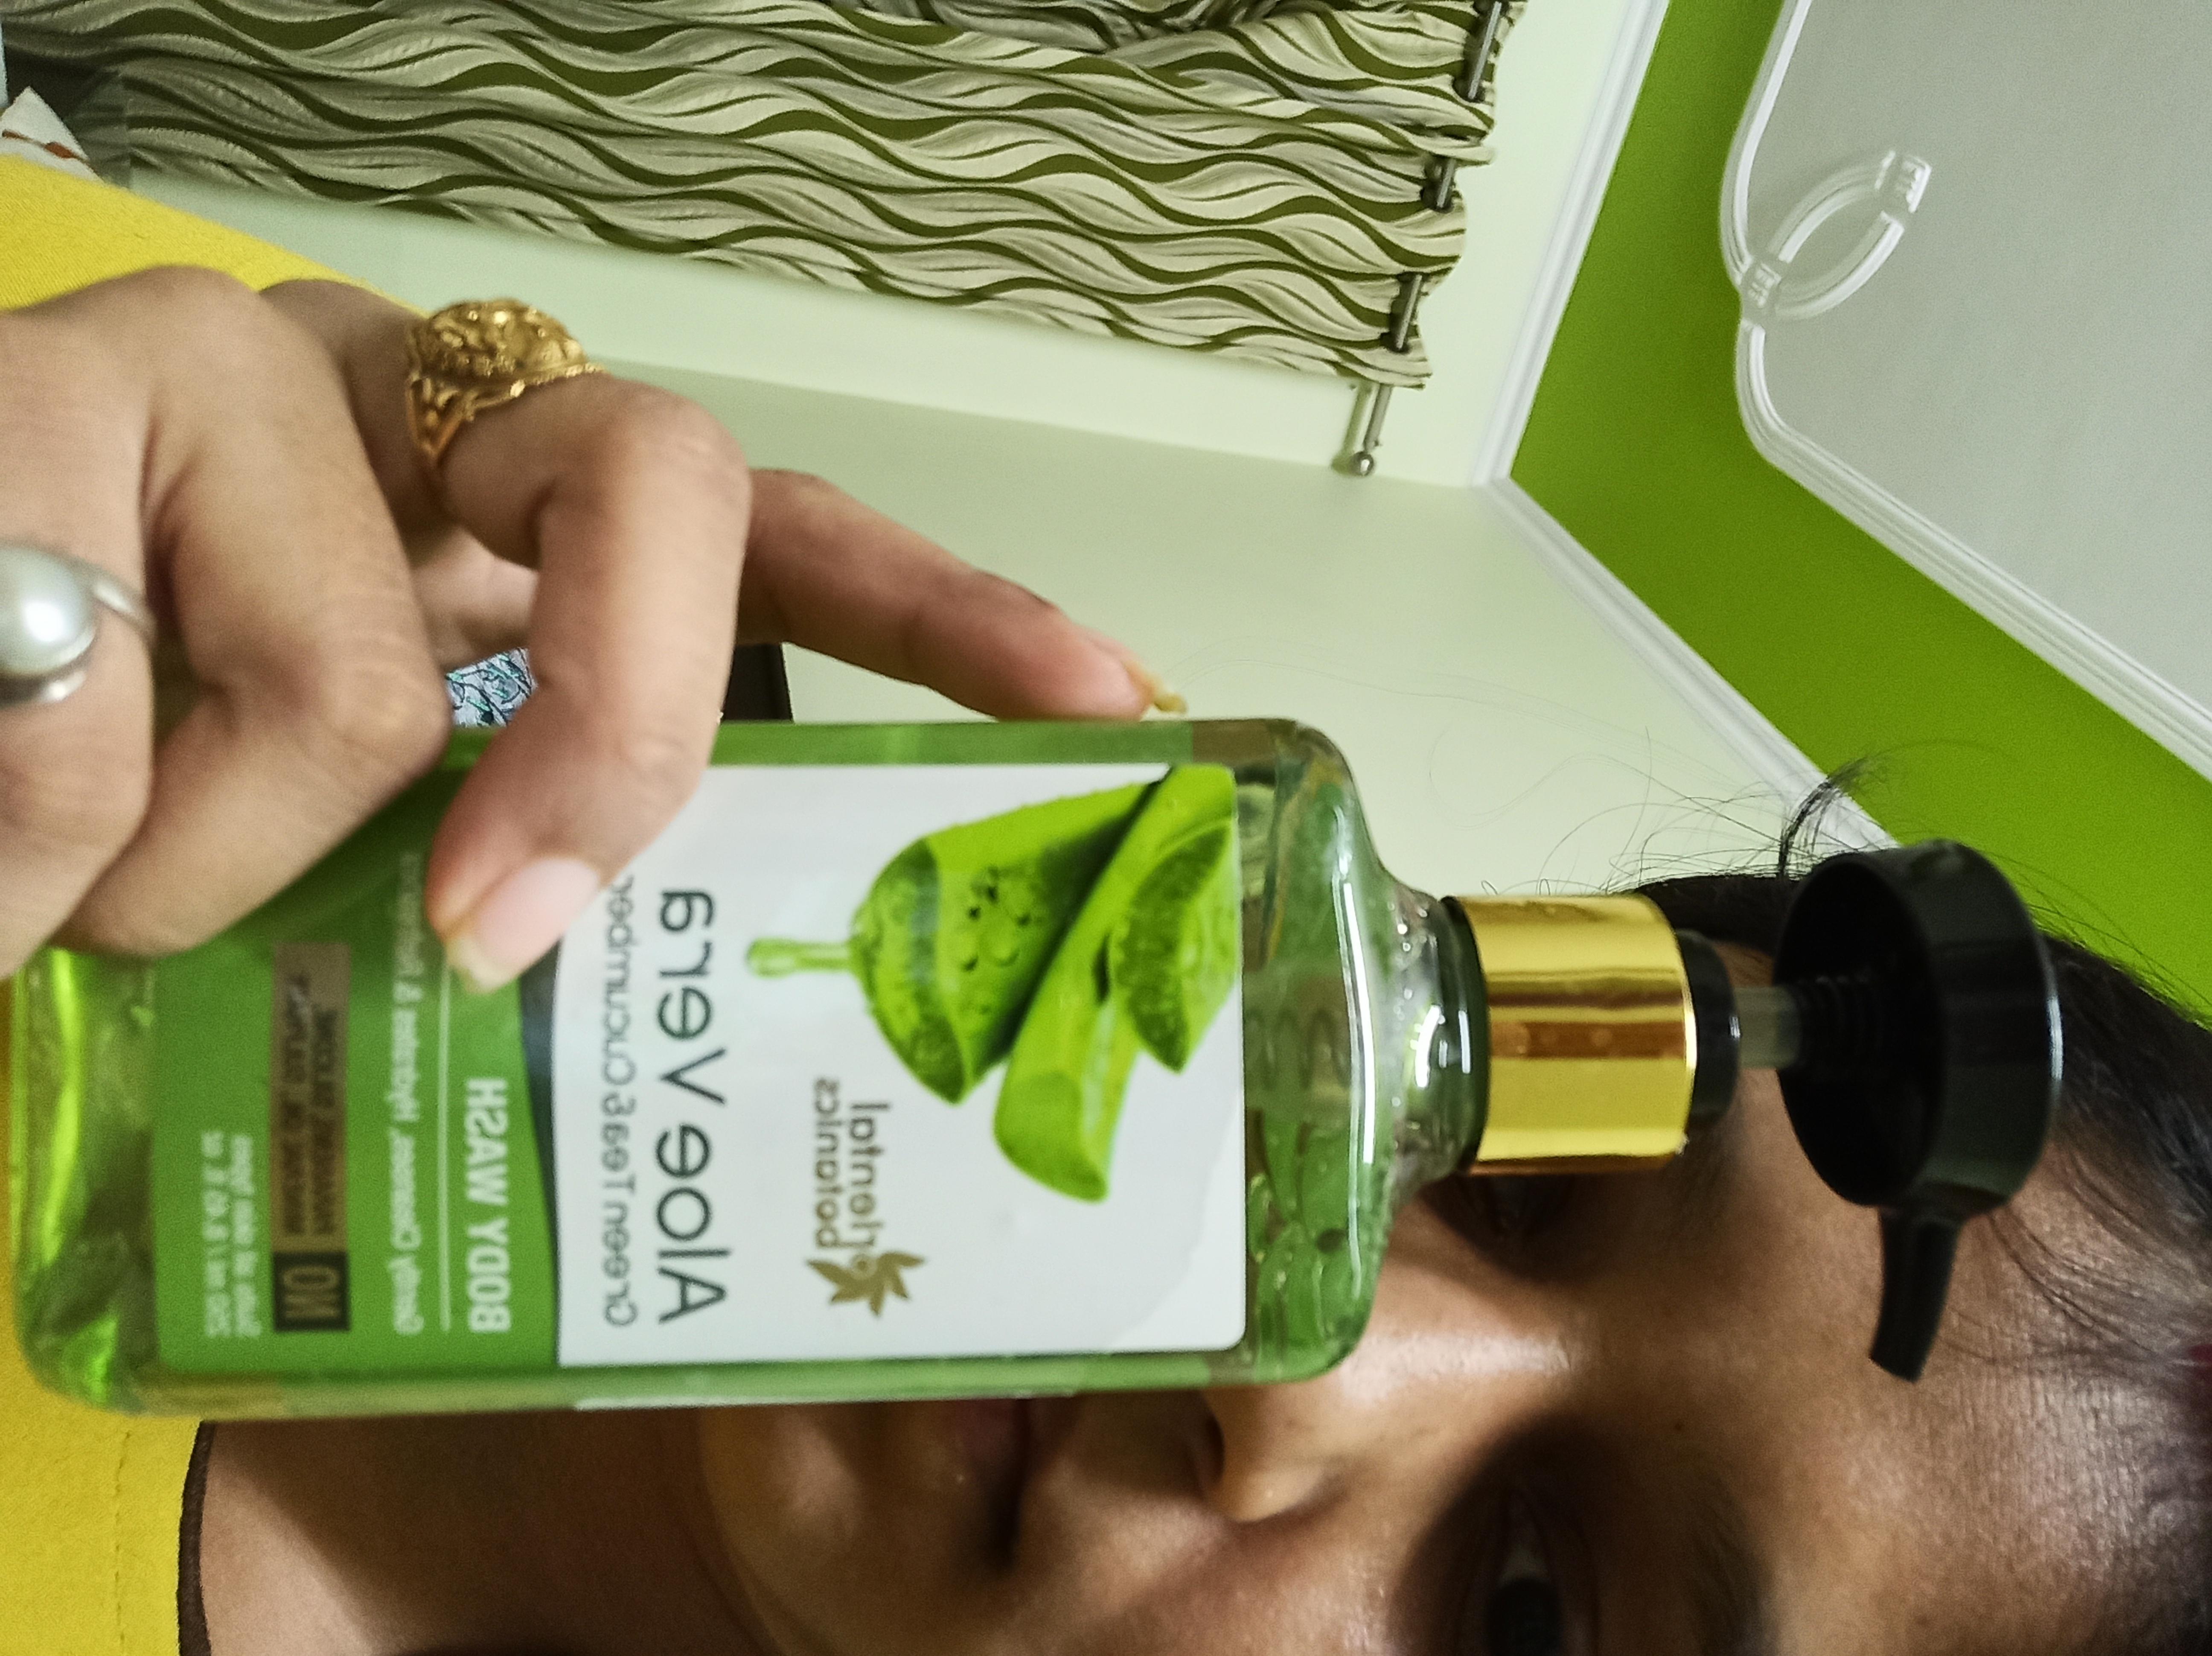 Oriental Botanics Aloe Vera Green Tea & Cucumber Body Wash-Great body wash-By kanu4